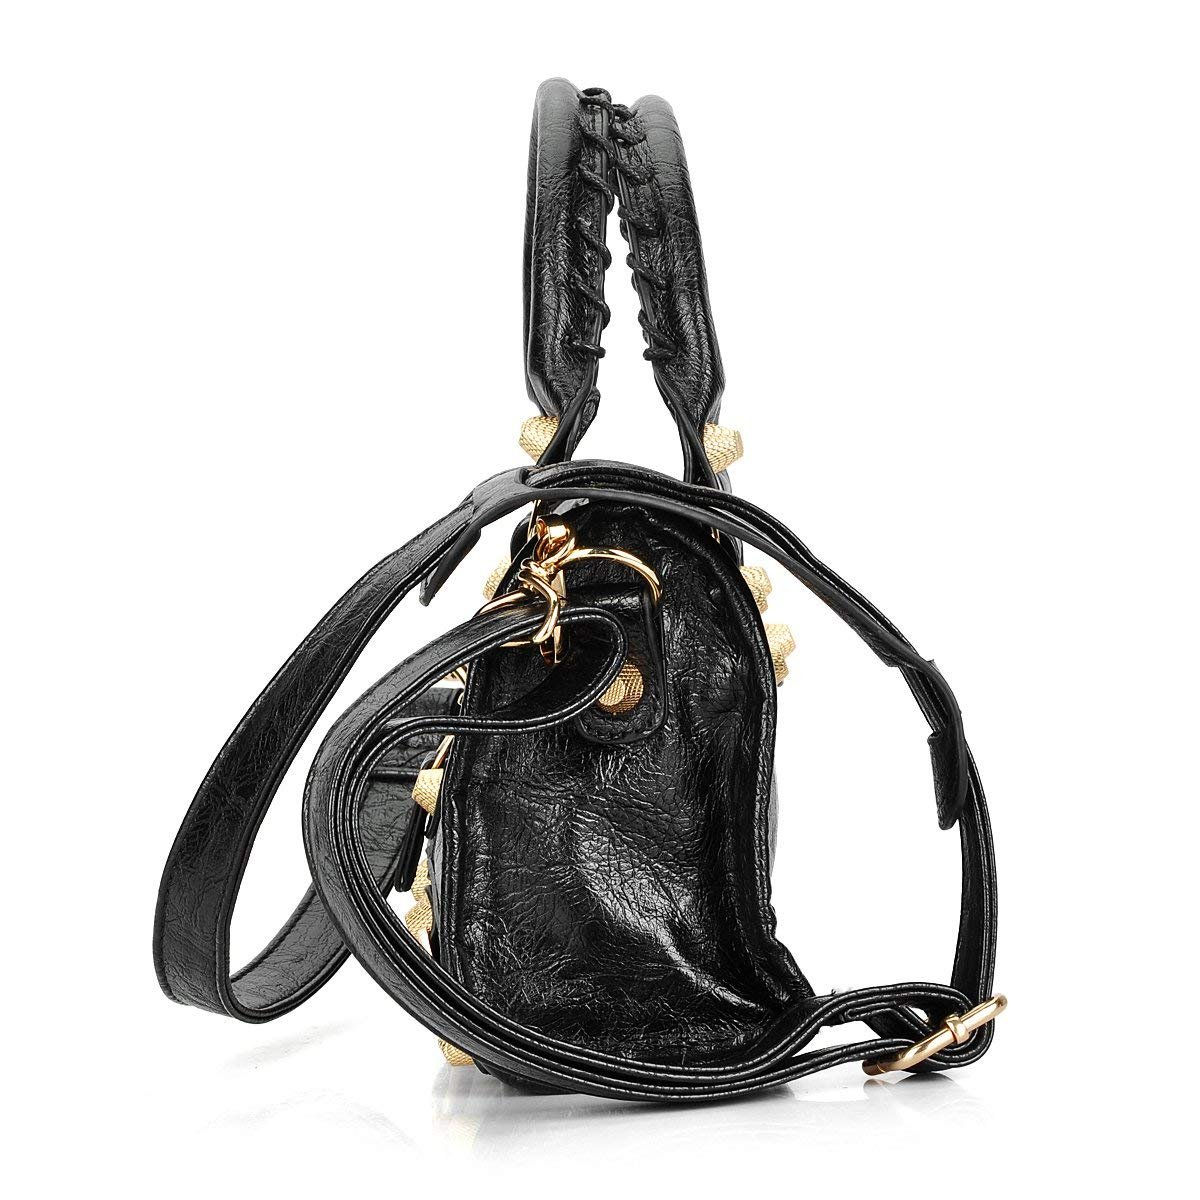 Gold-Tech Women Leather Big Gold Color Studed Motorcycle Bags 38cm Medium Size Shoulder Bag 2 Colors (24cm Black) by Gold-Tech (Image #2)